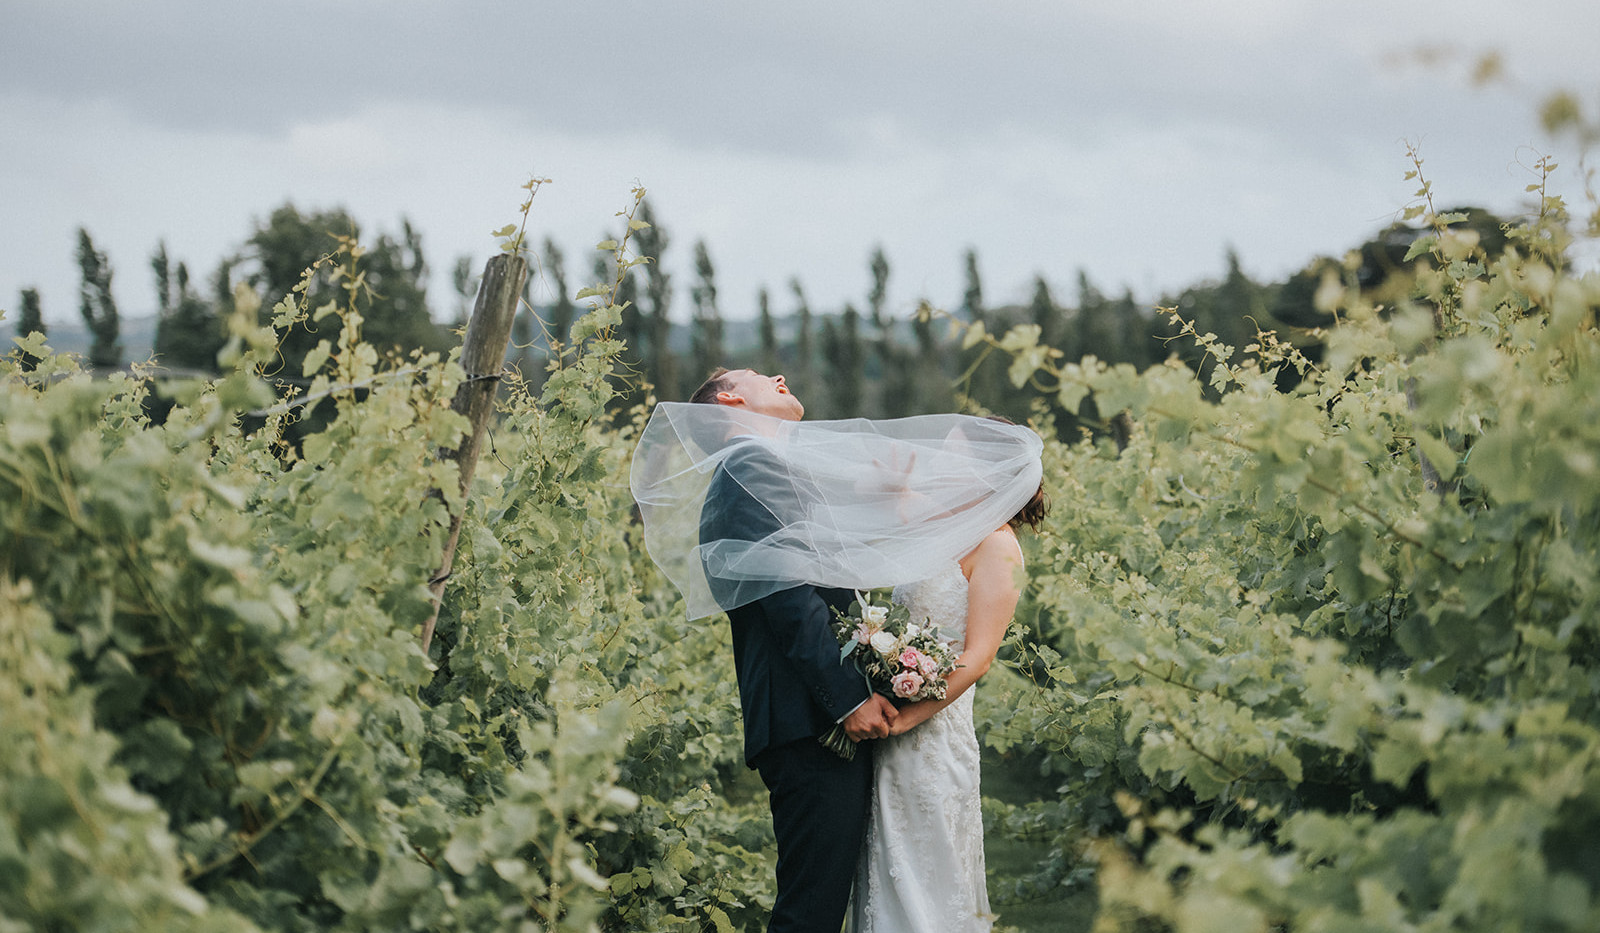 Wedding at Llanerch Vineyard